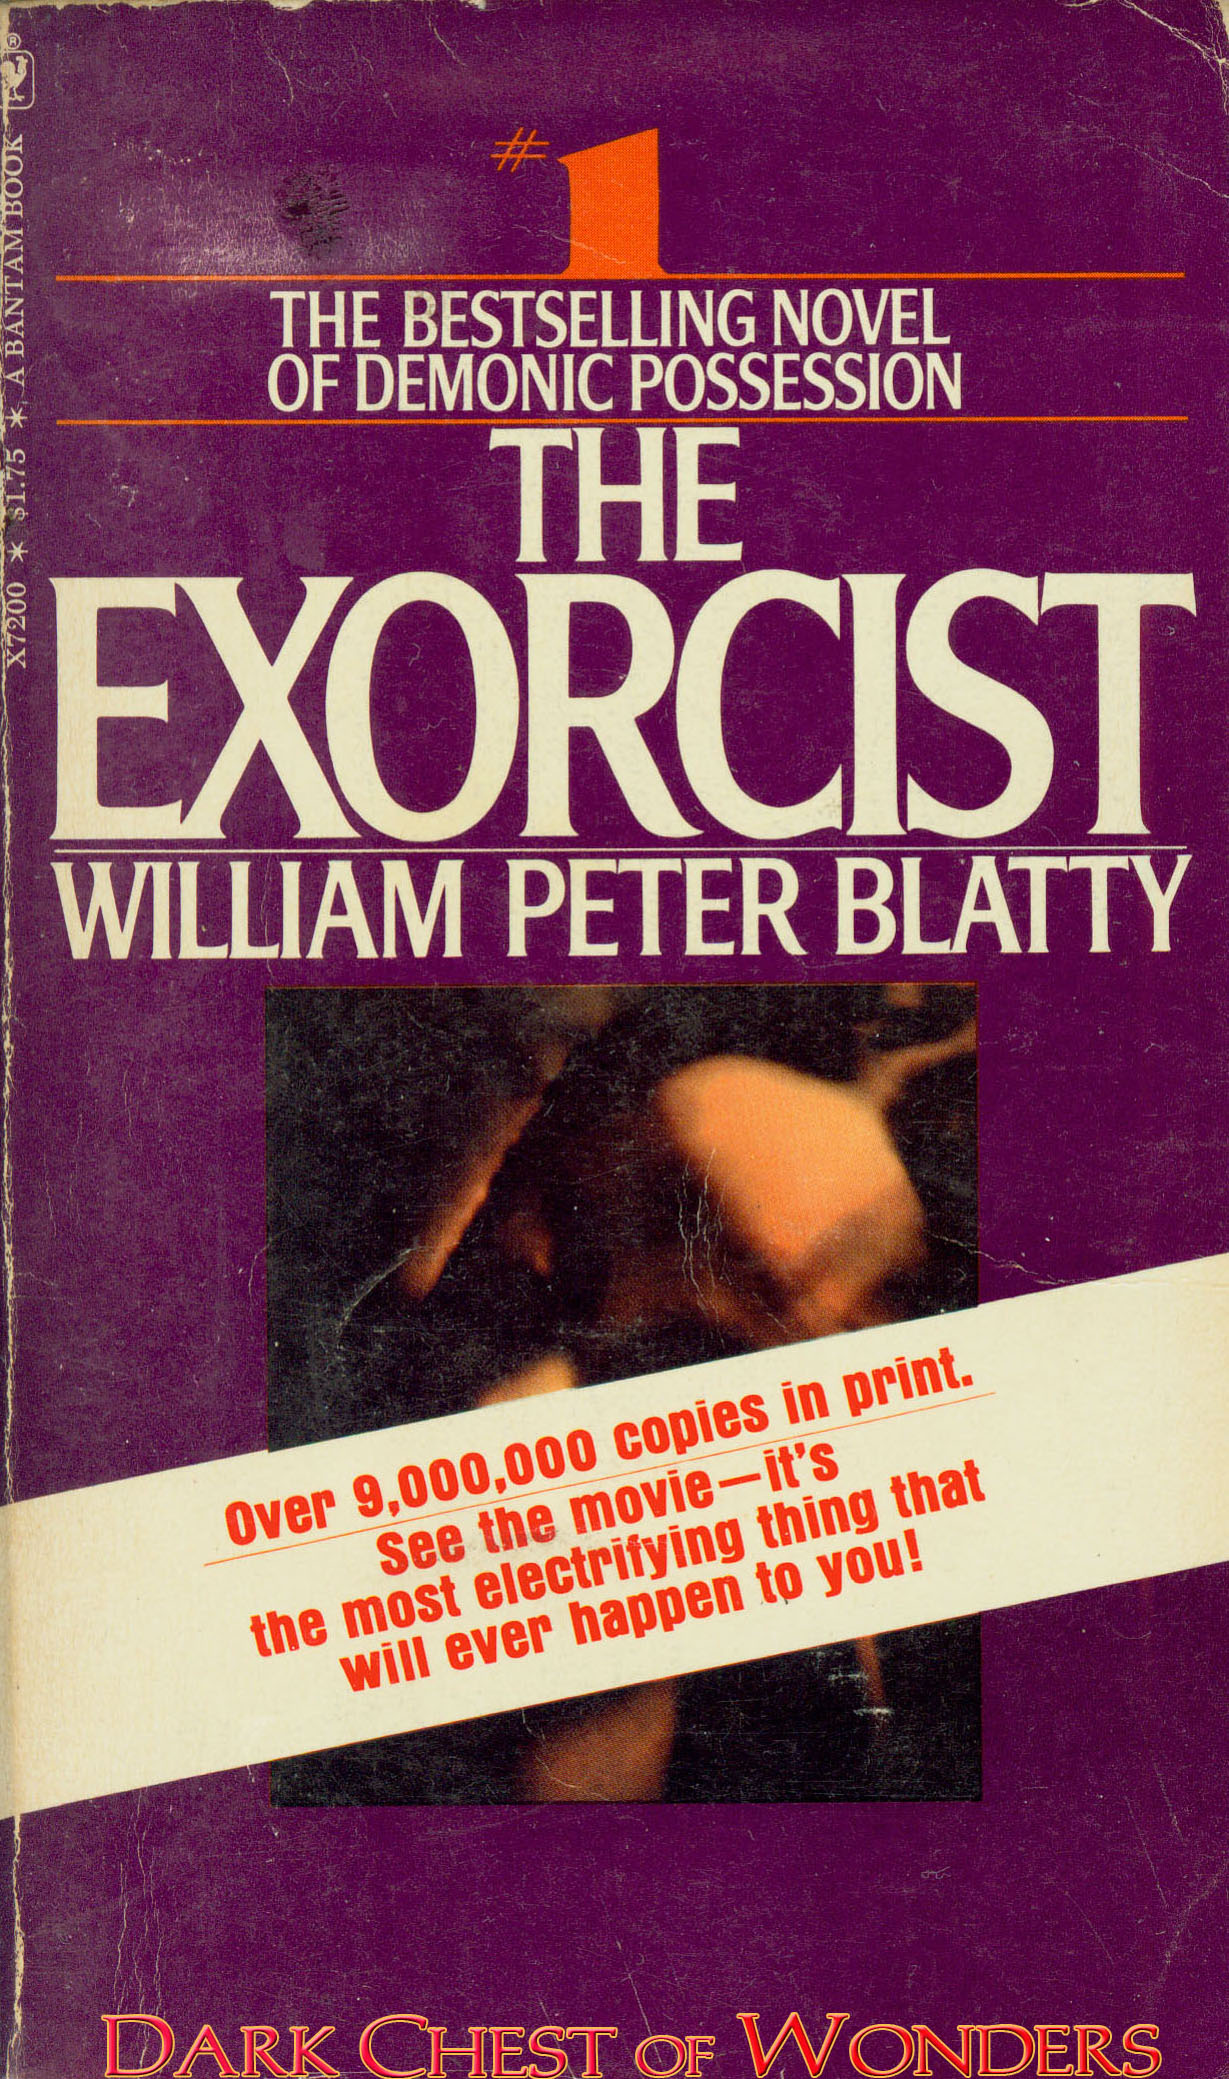 Paperback, Bantam Books 1974